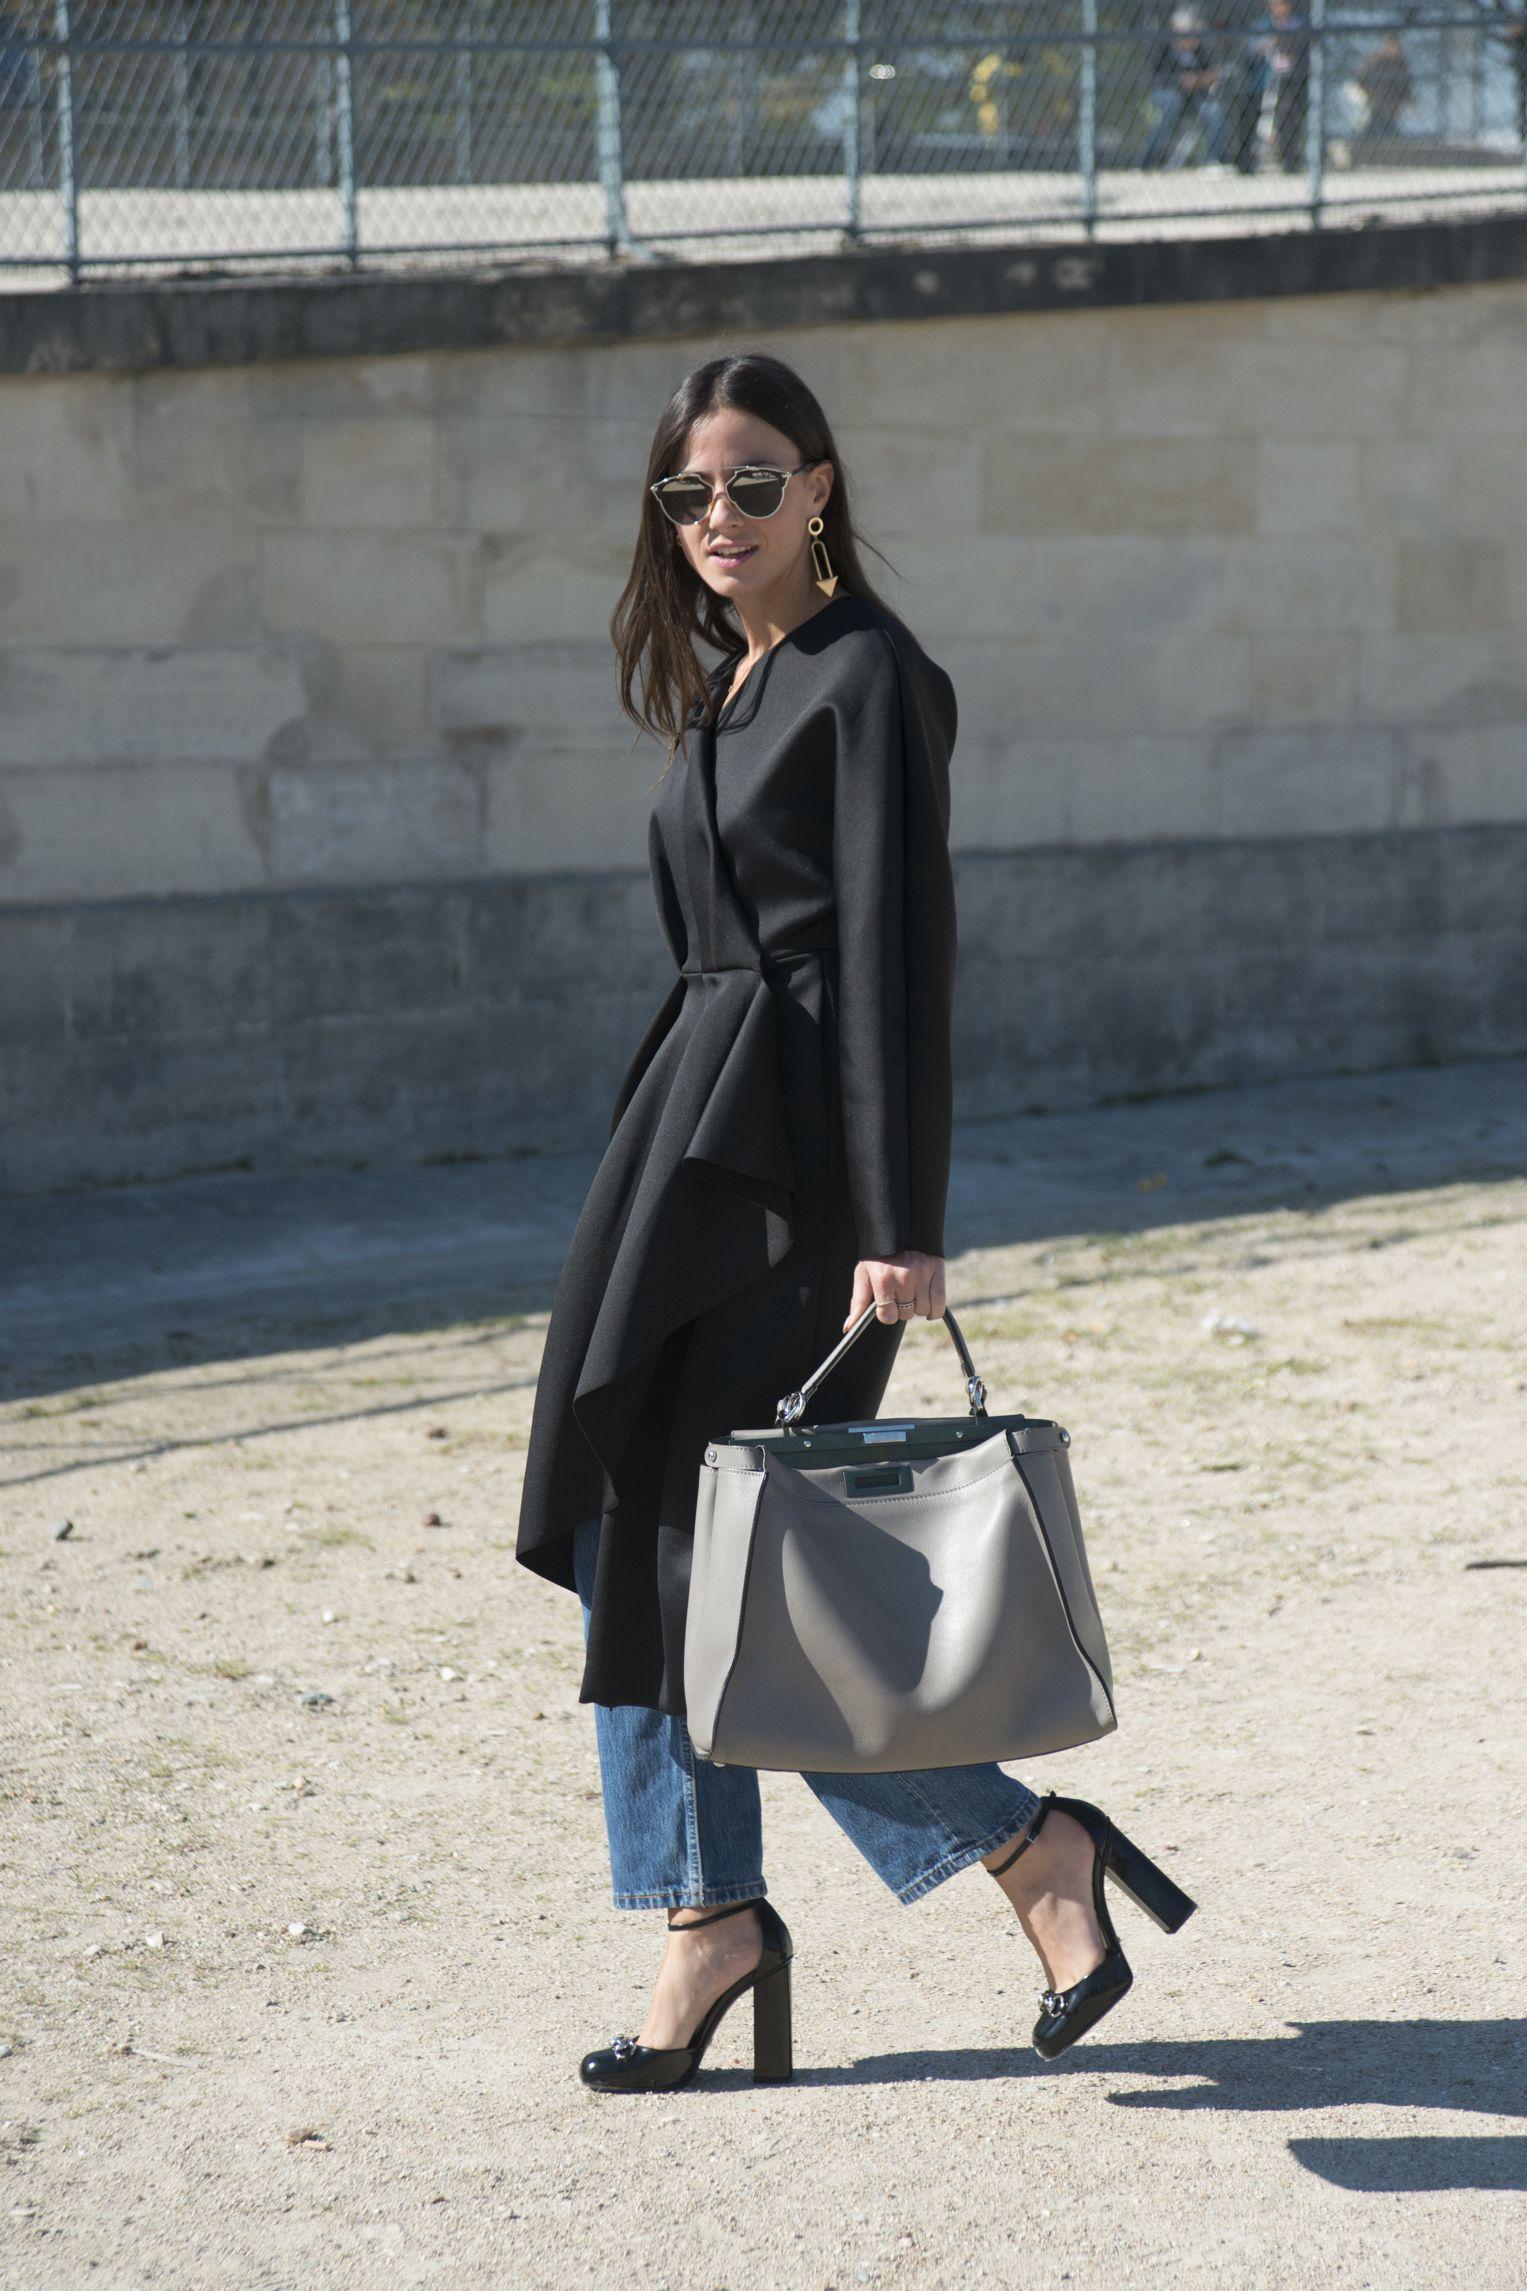 Zina Charkoplia - Paris Fashion Week Spring-Summer 2016 #PFW #StreetStyle